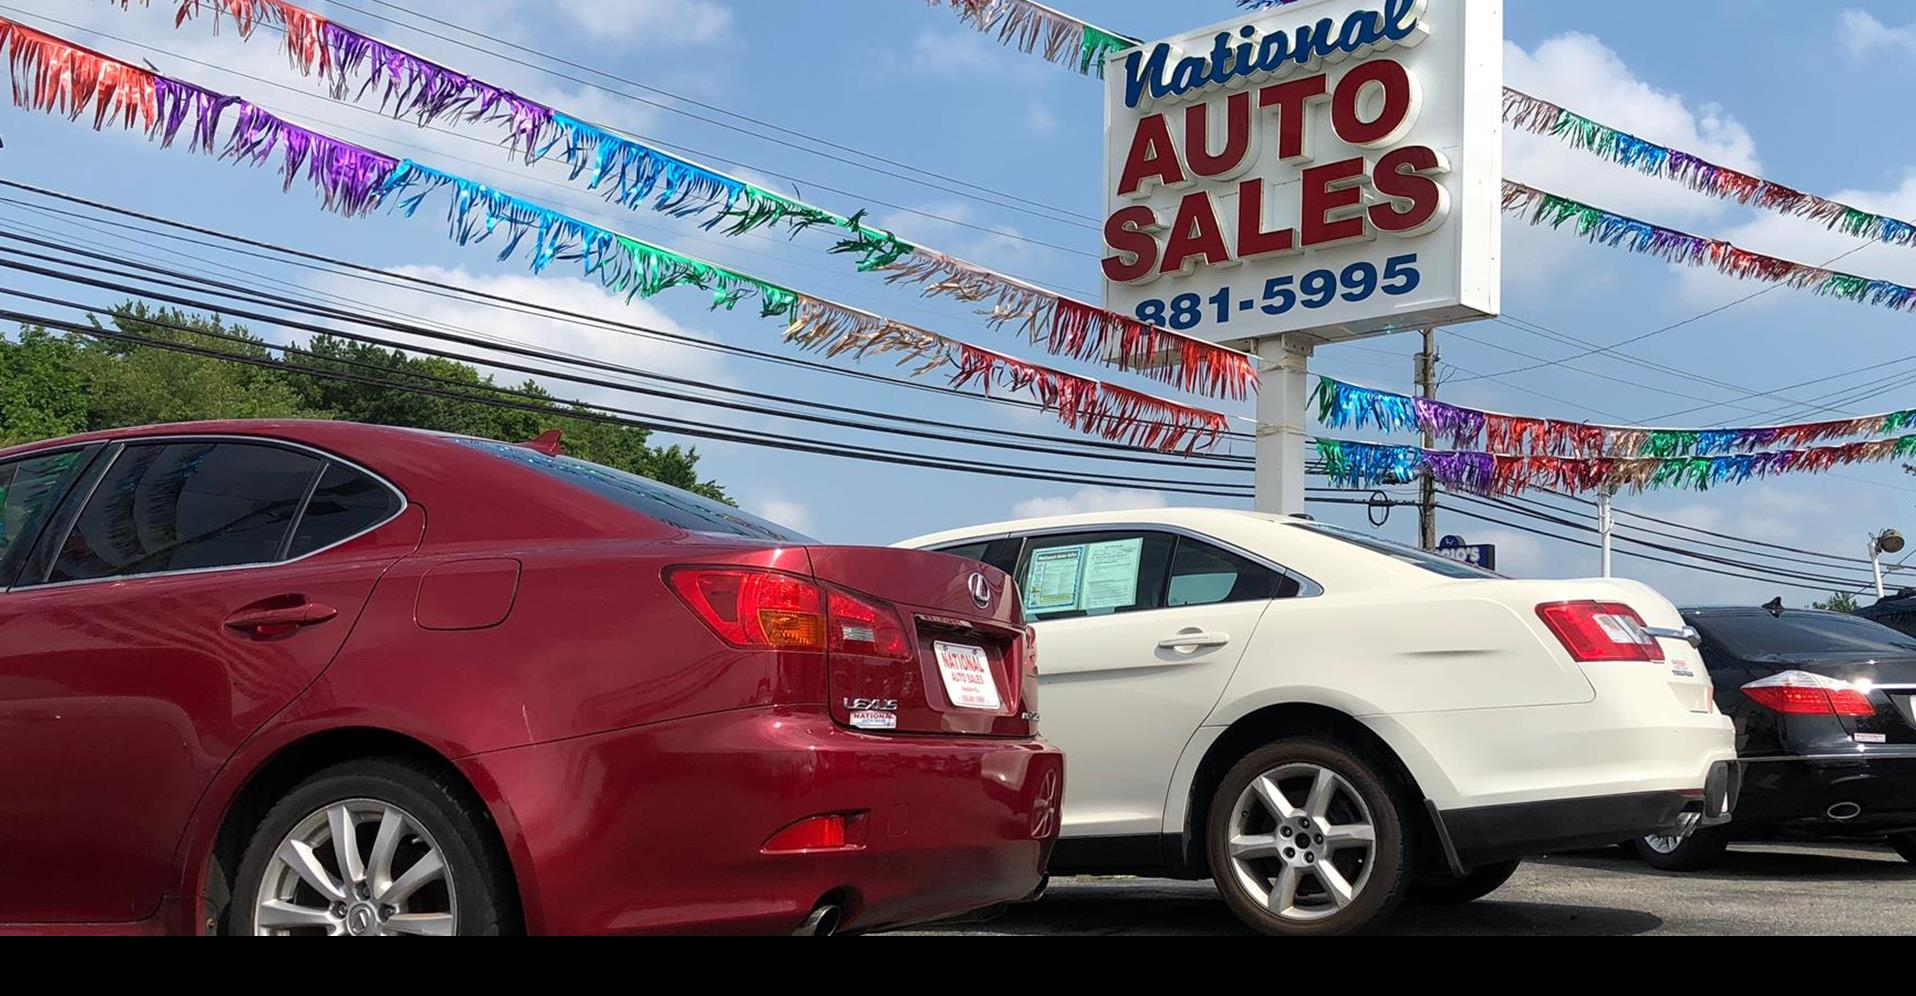 National Car Sales >> National Auto Sales Glassboro Nj Used Cars Trucks Sales